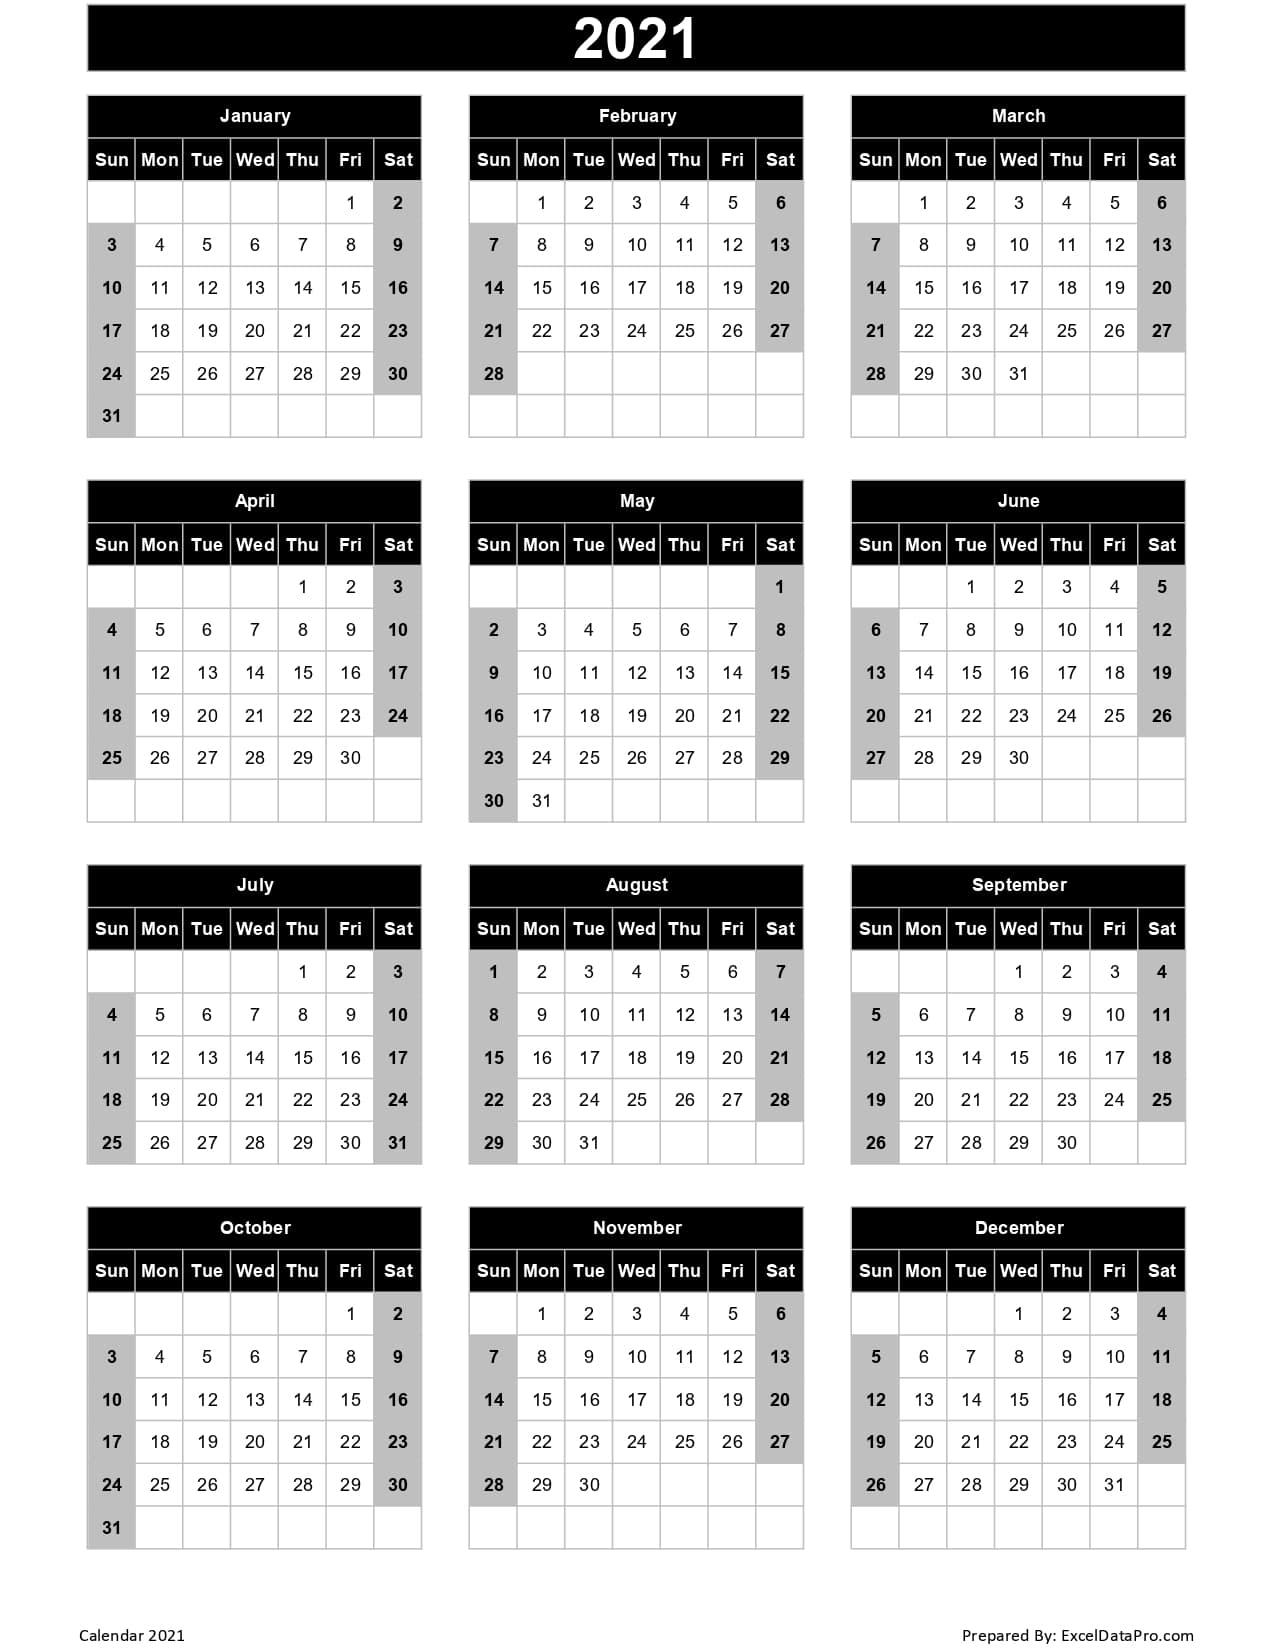 Calendar 2021 Excel Templates, Printable Pdfs & Images